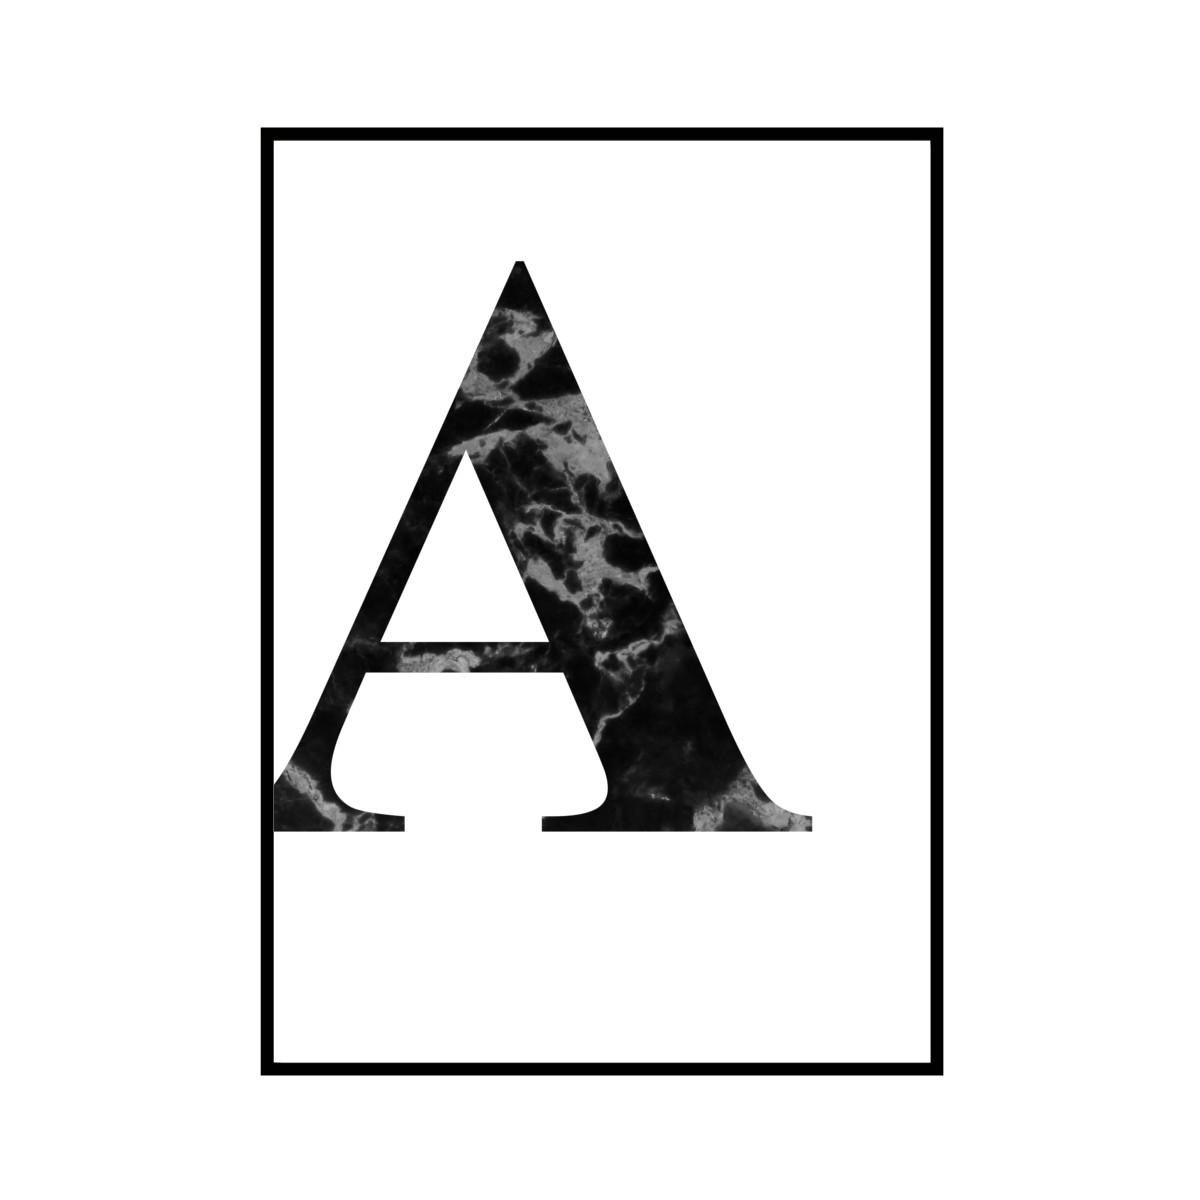 """A"" 黒大理石 - Black marble - ALPHAシリーズ [SD-000502] A1サイズ ポスター単品"